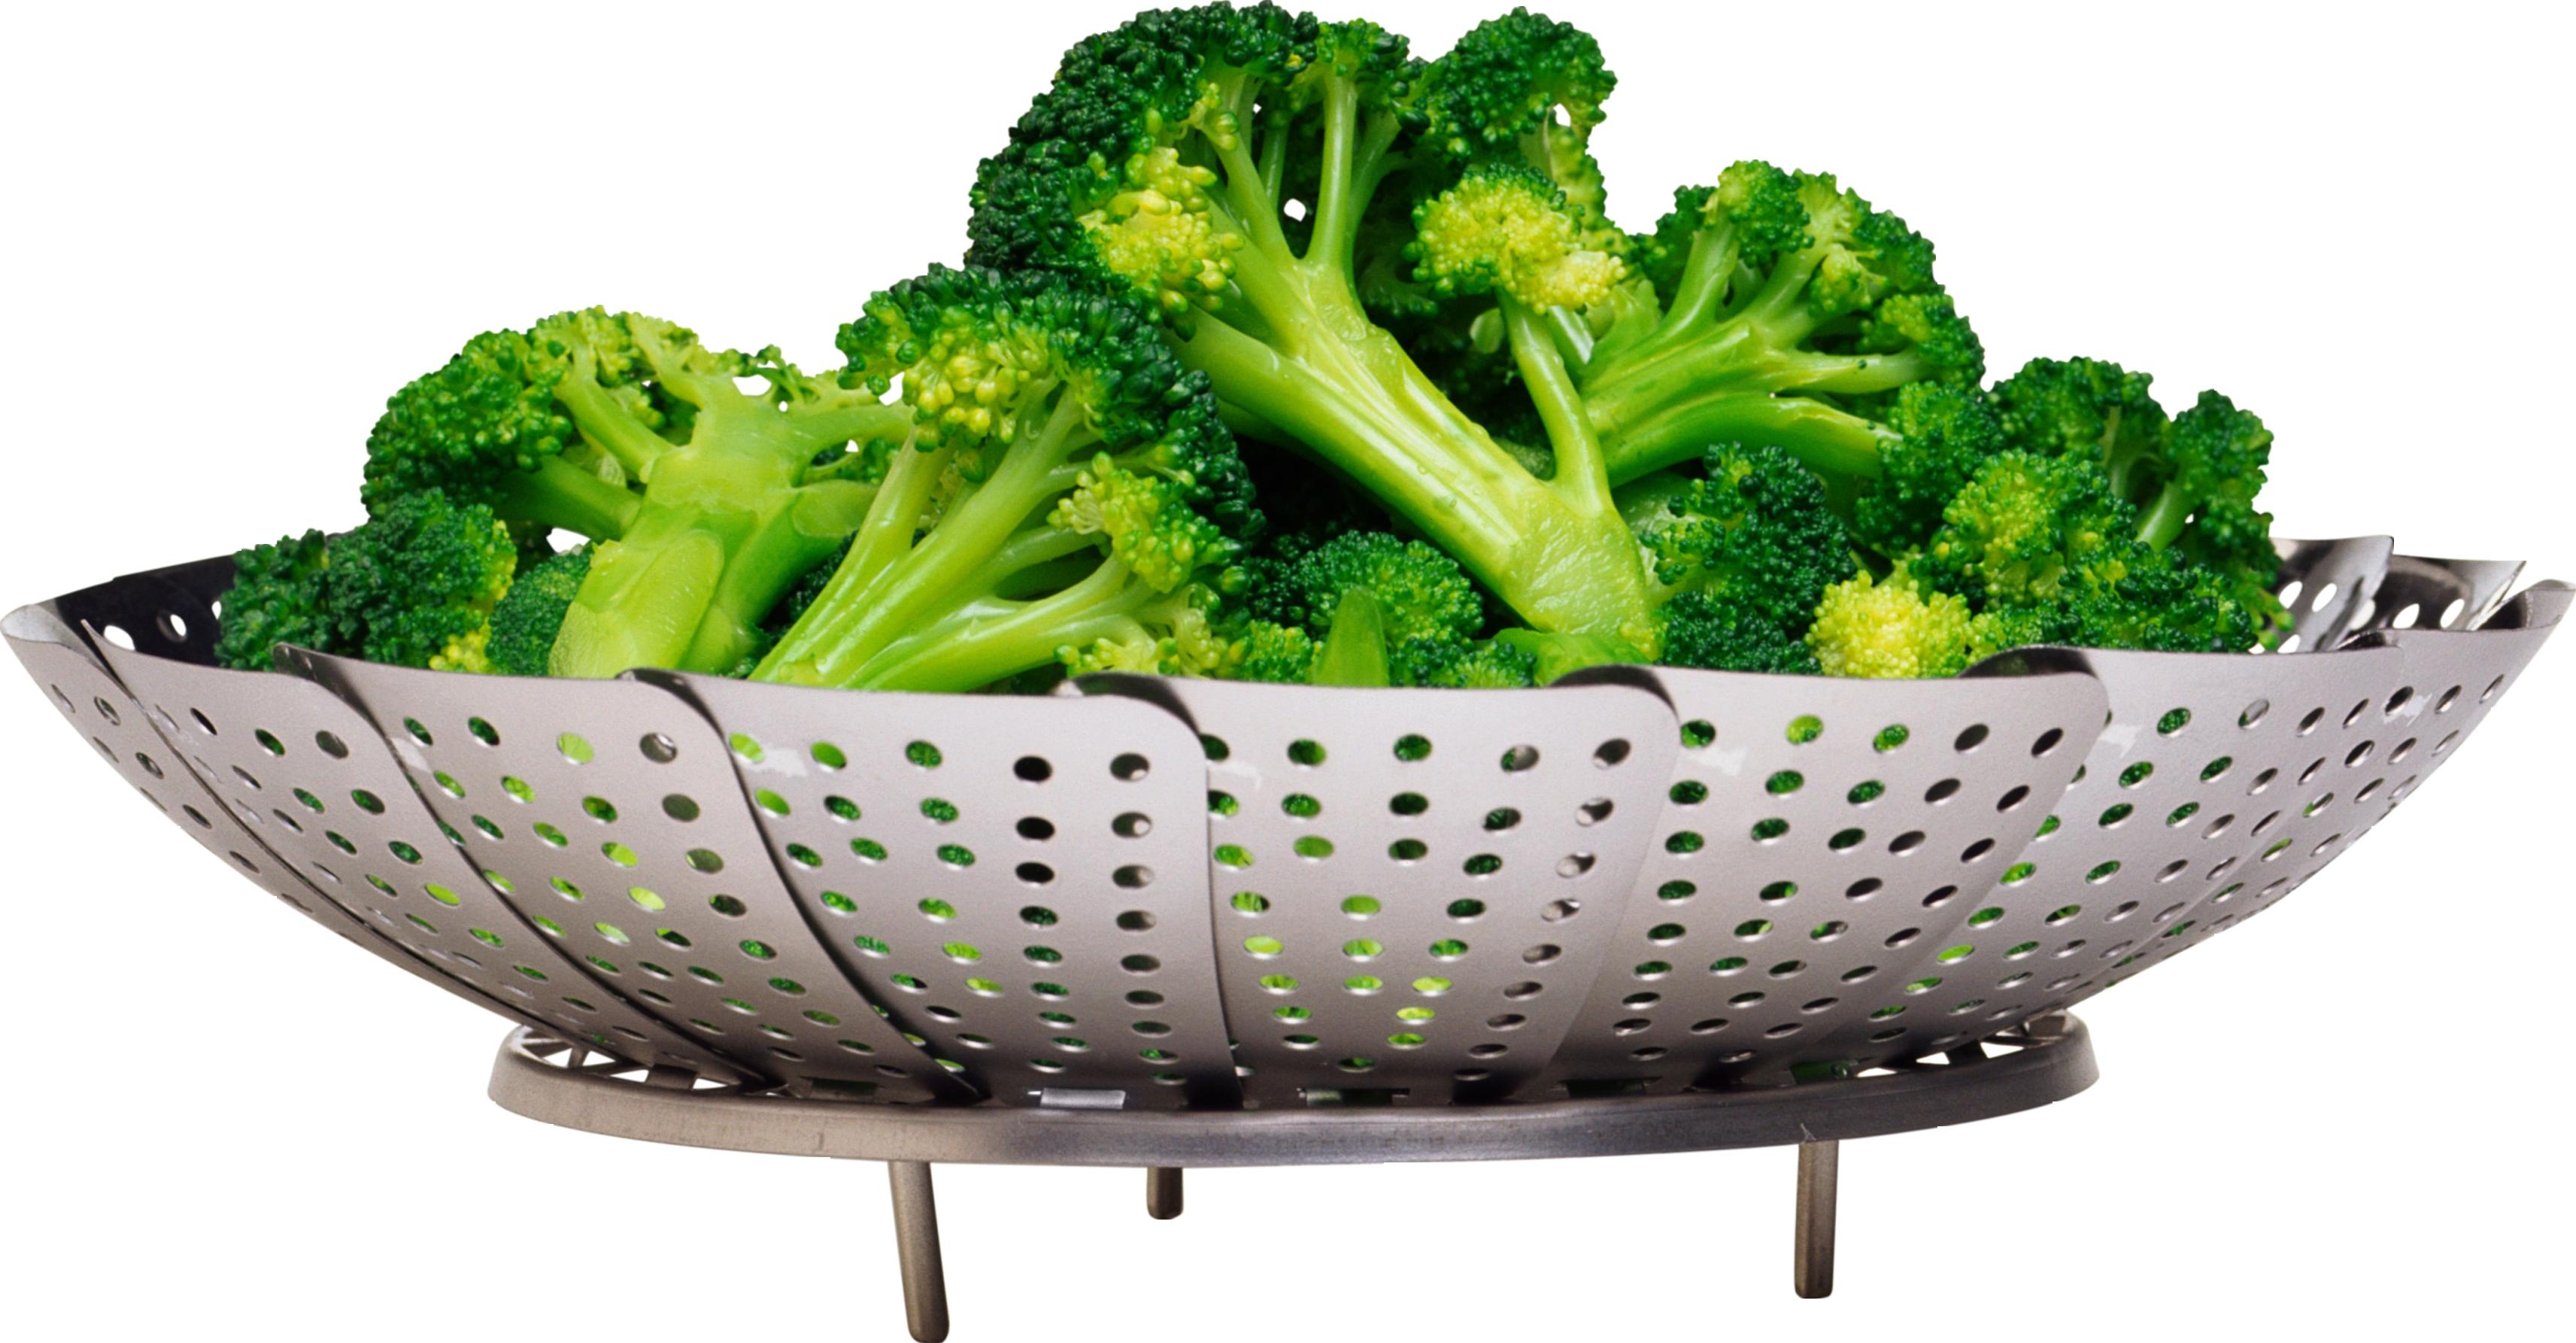 Lettuce clipart broccoli. Ten isolated stock photo